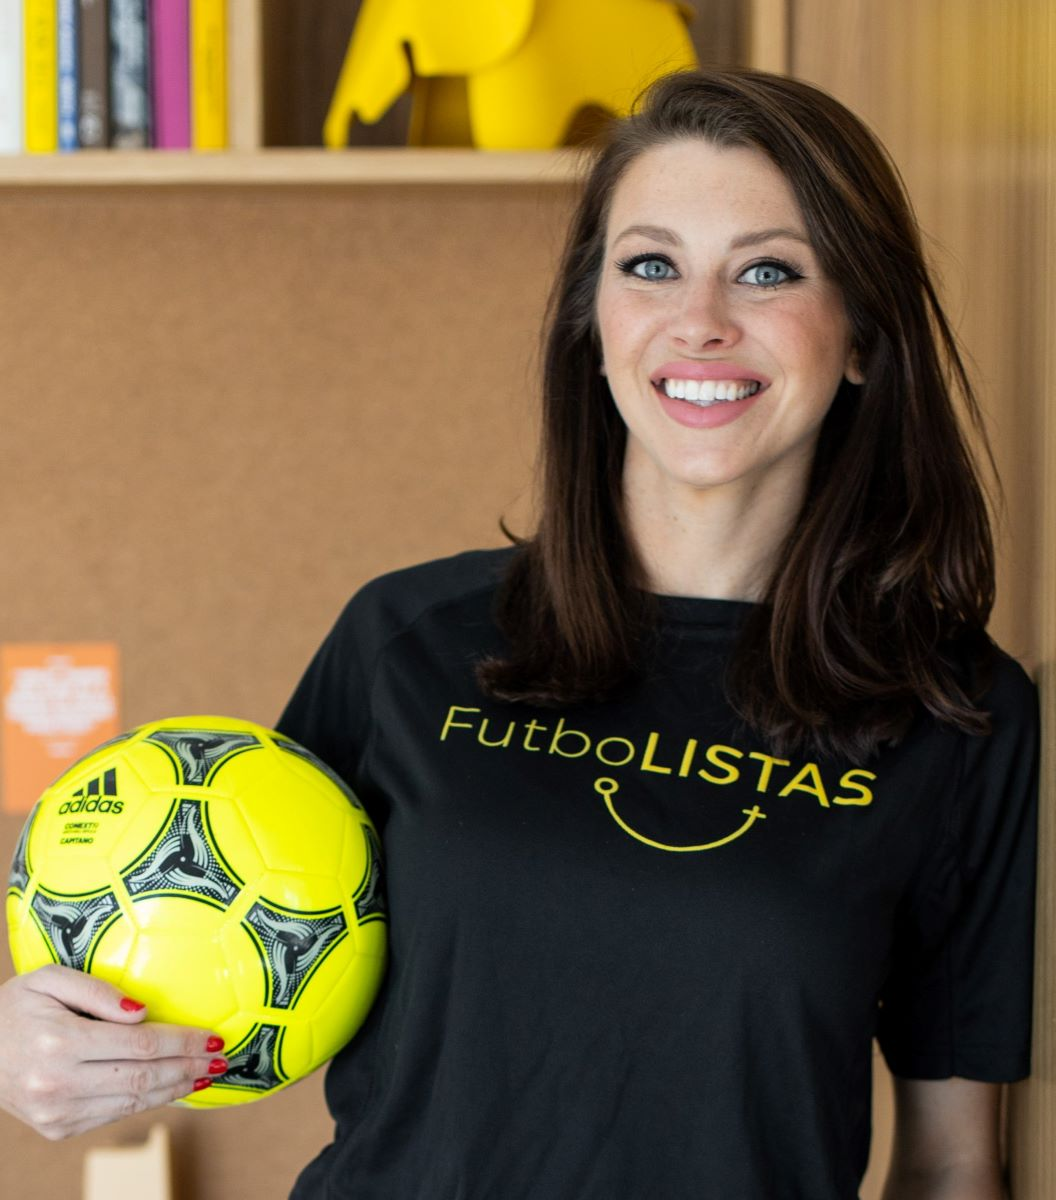 FutboLISTAS founder ,Brittany Gropp